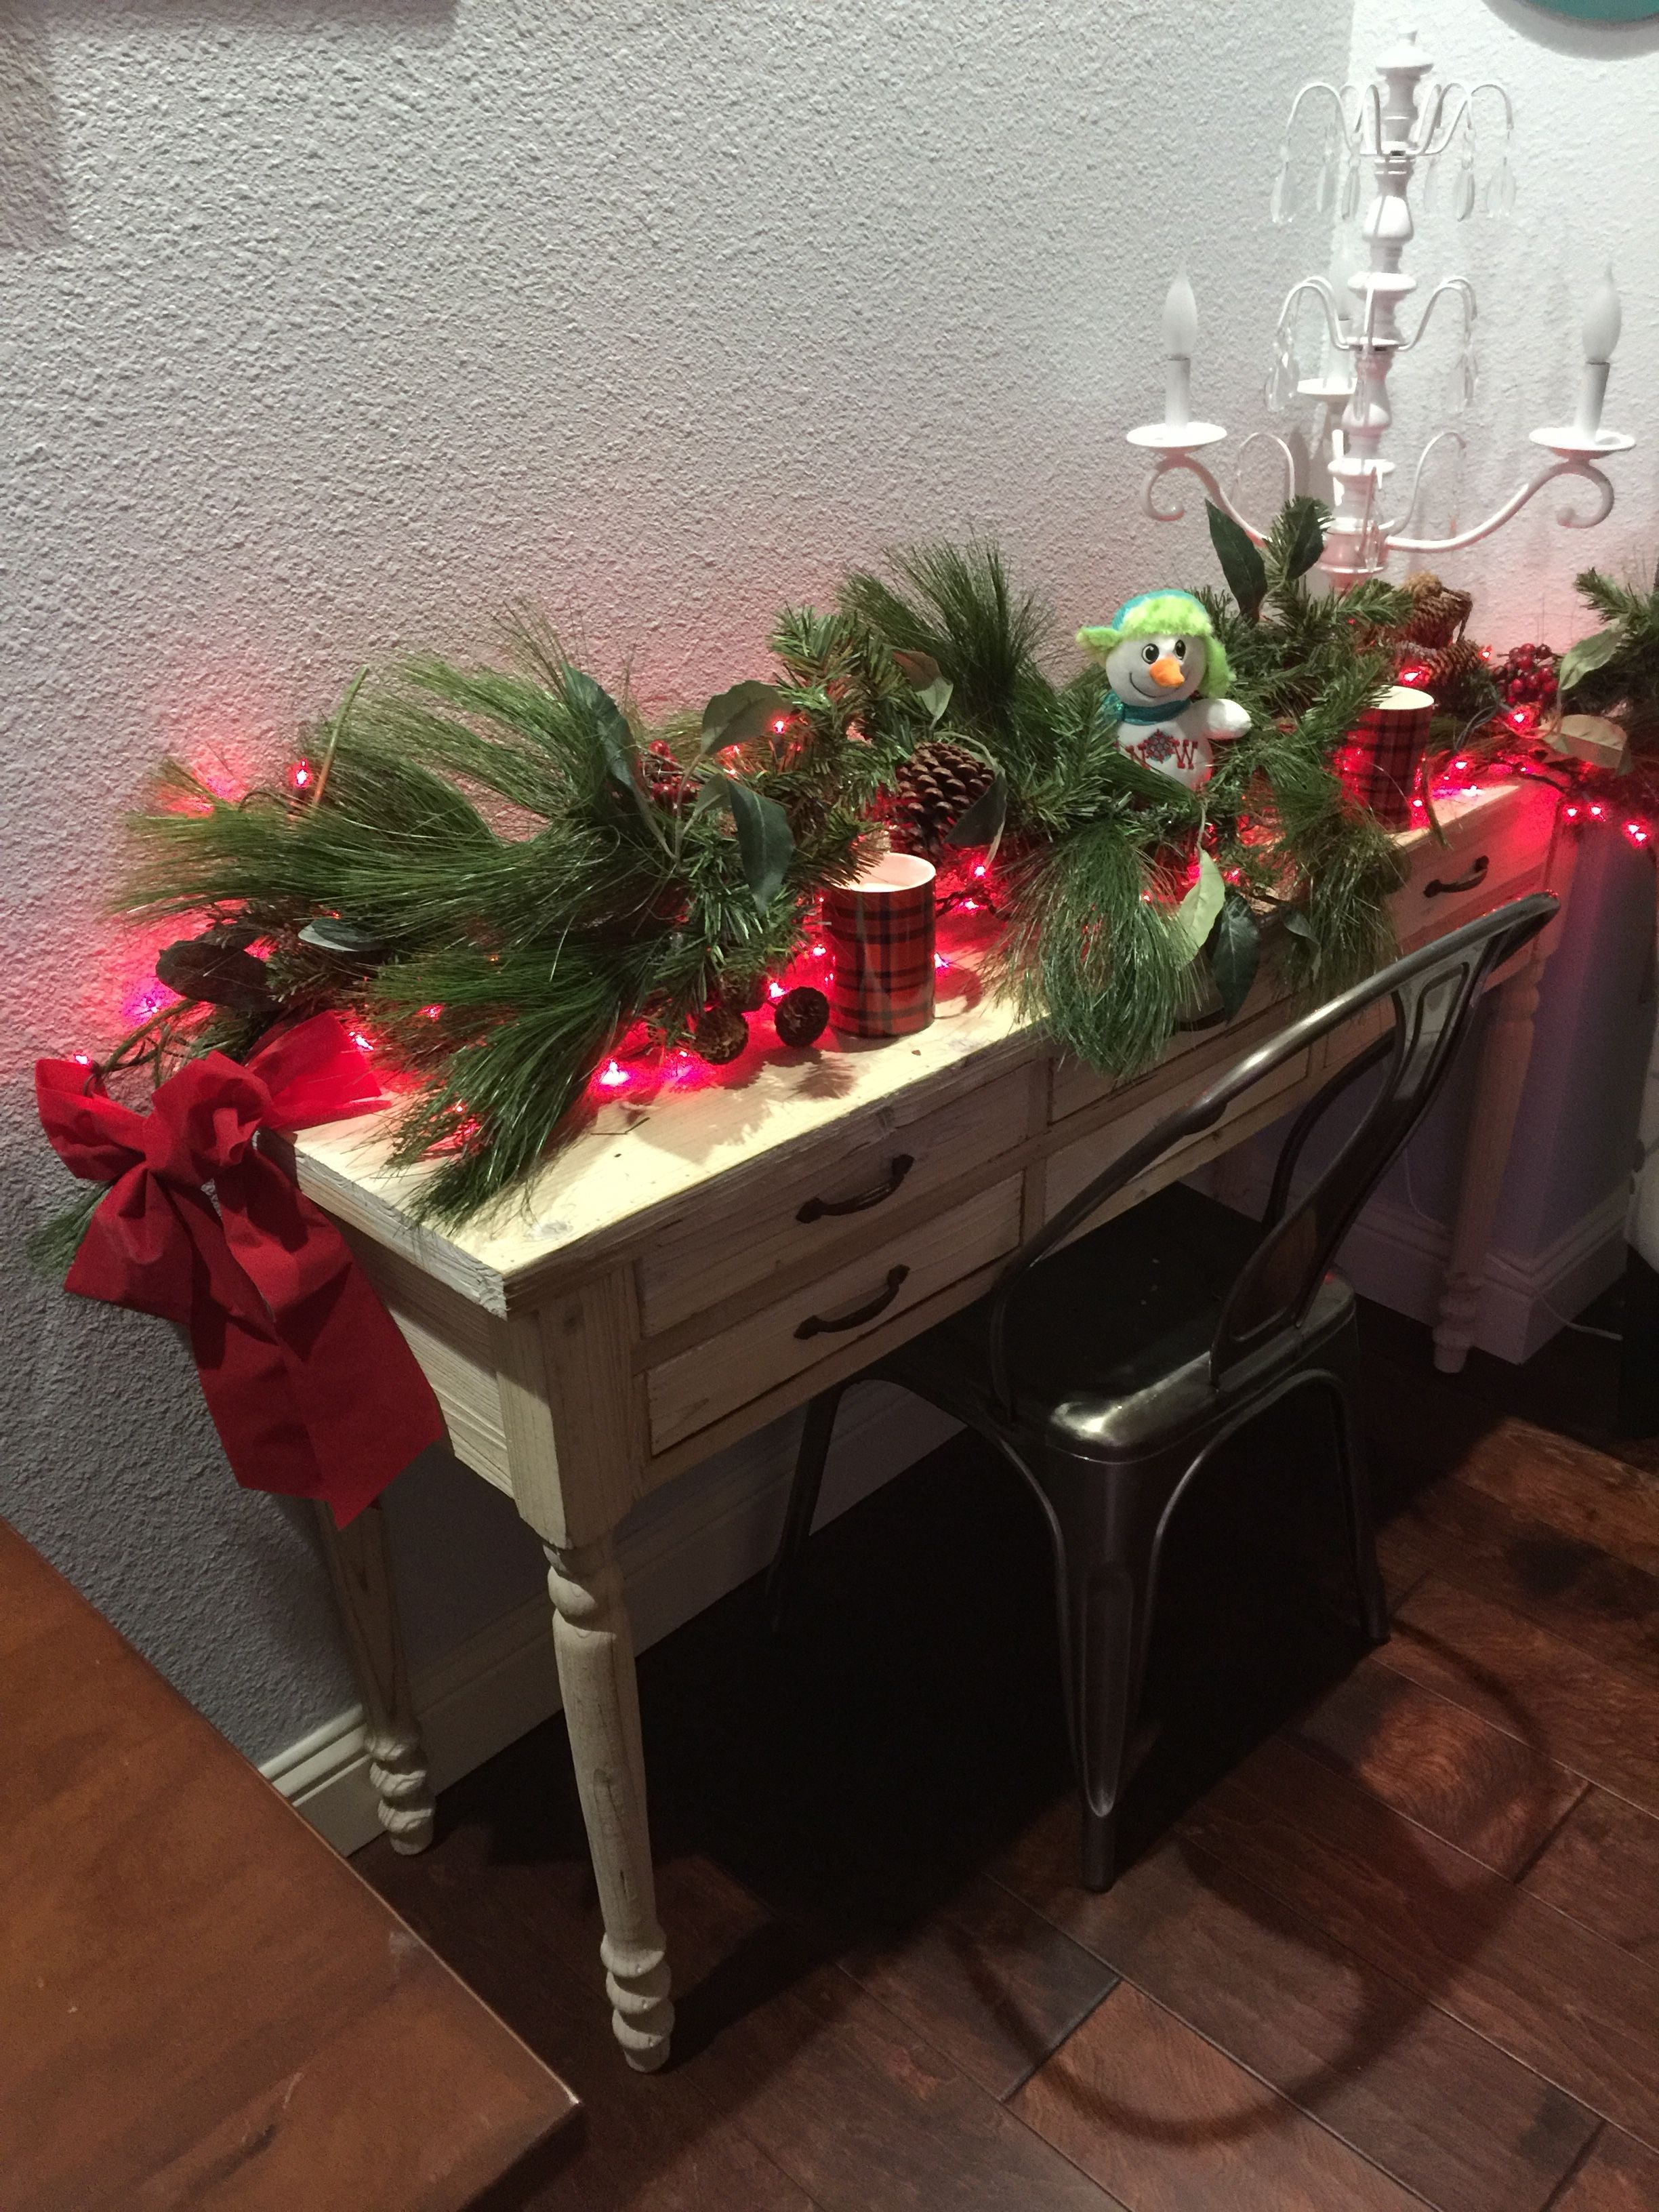 I Side Tables For Decorating Boardwalkchristmas Holiday Decor Decor Christmas